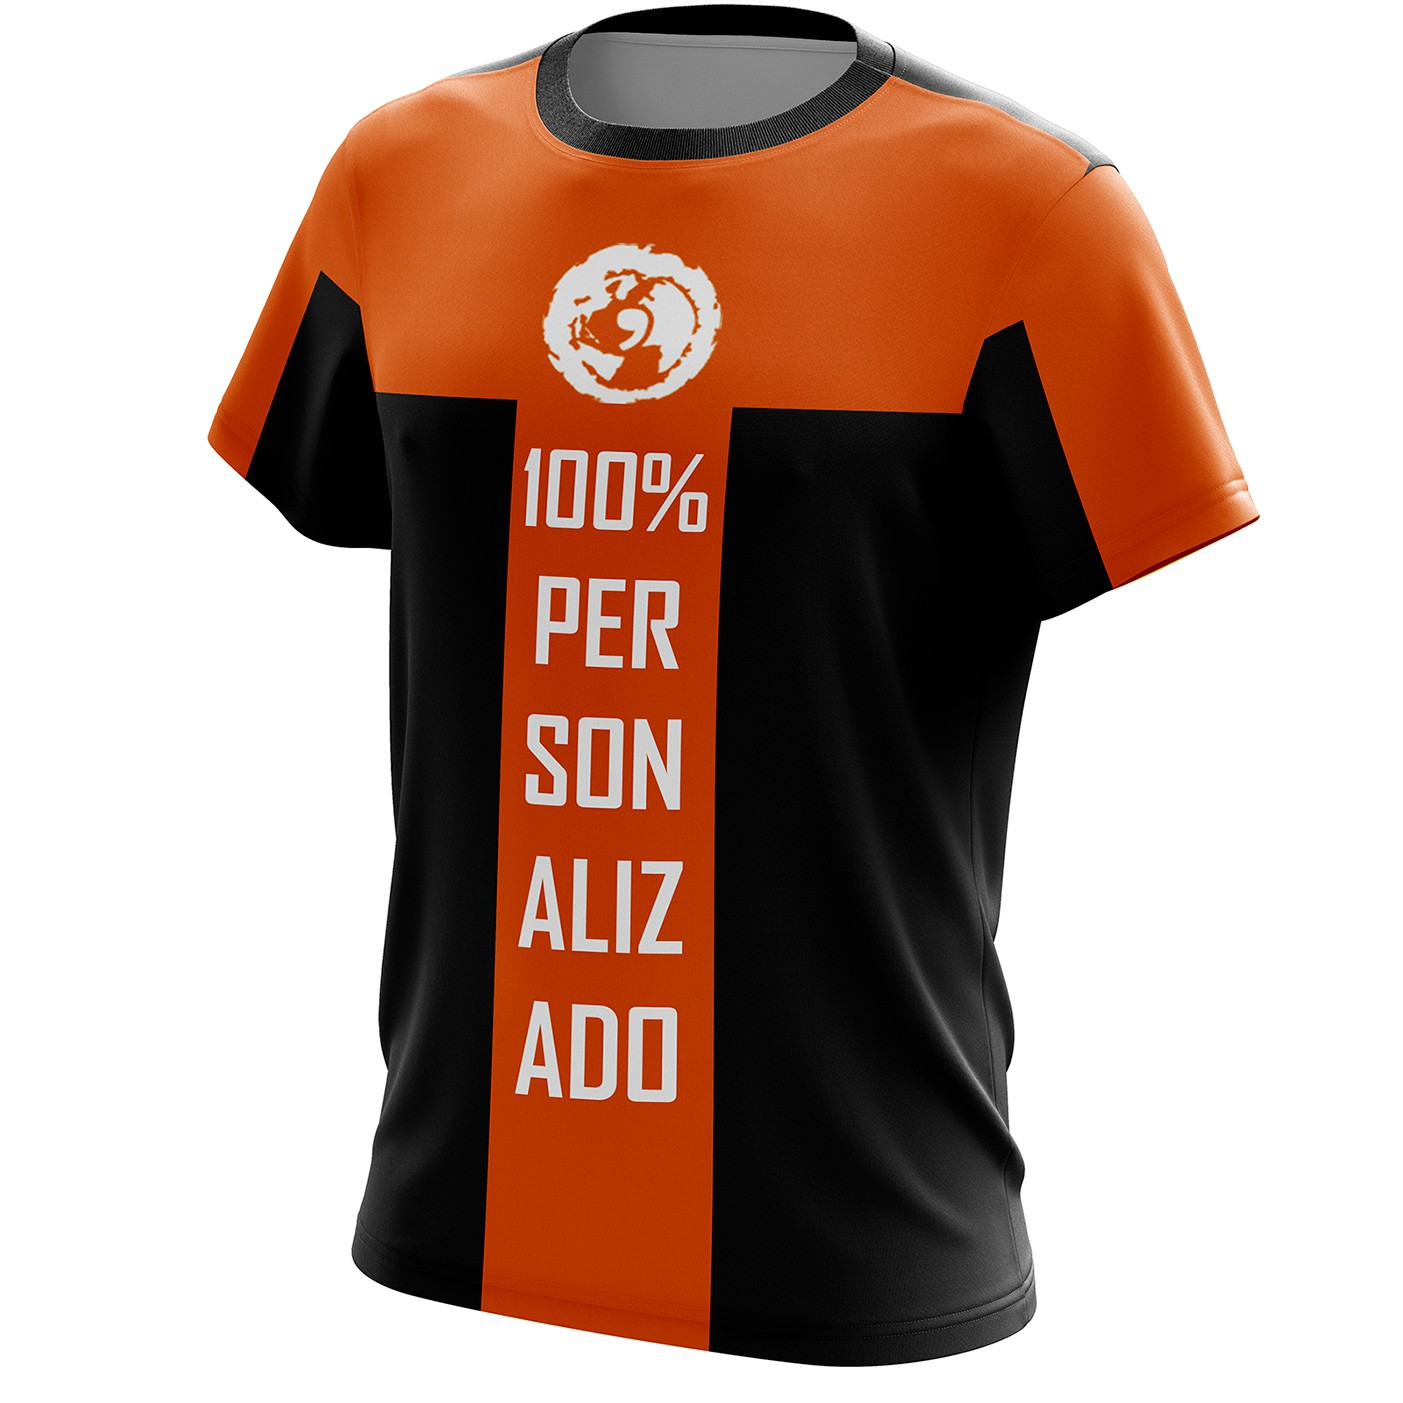 Camiseta personalizada tradicional e raglan